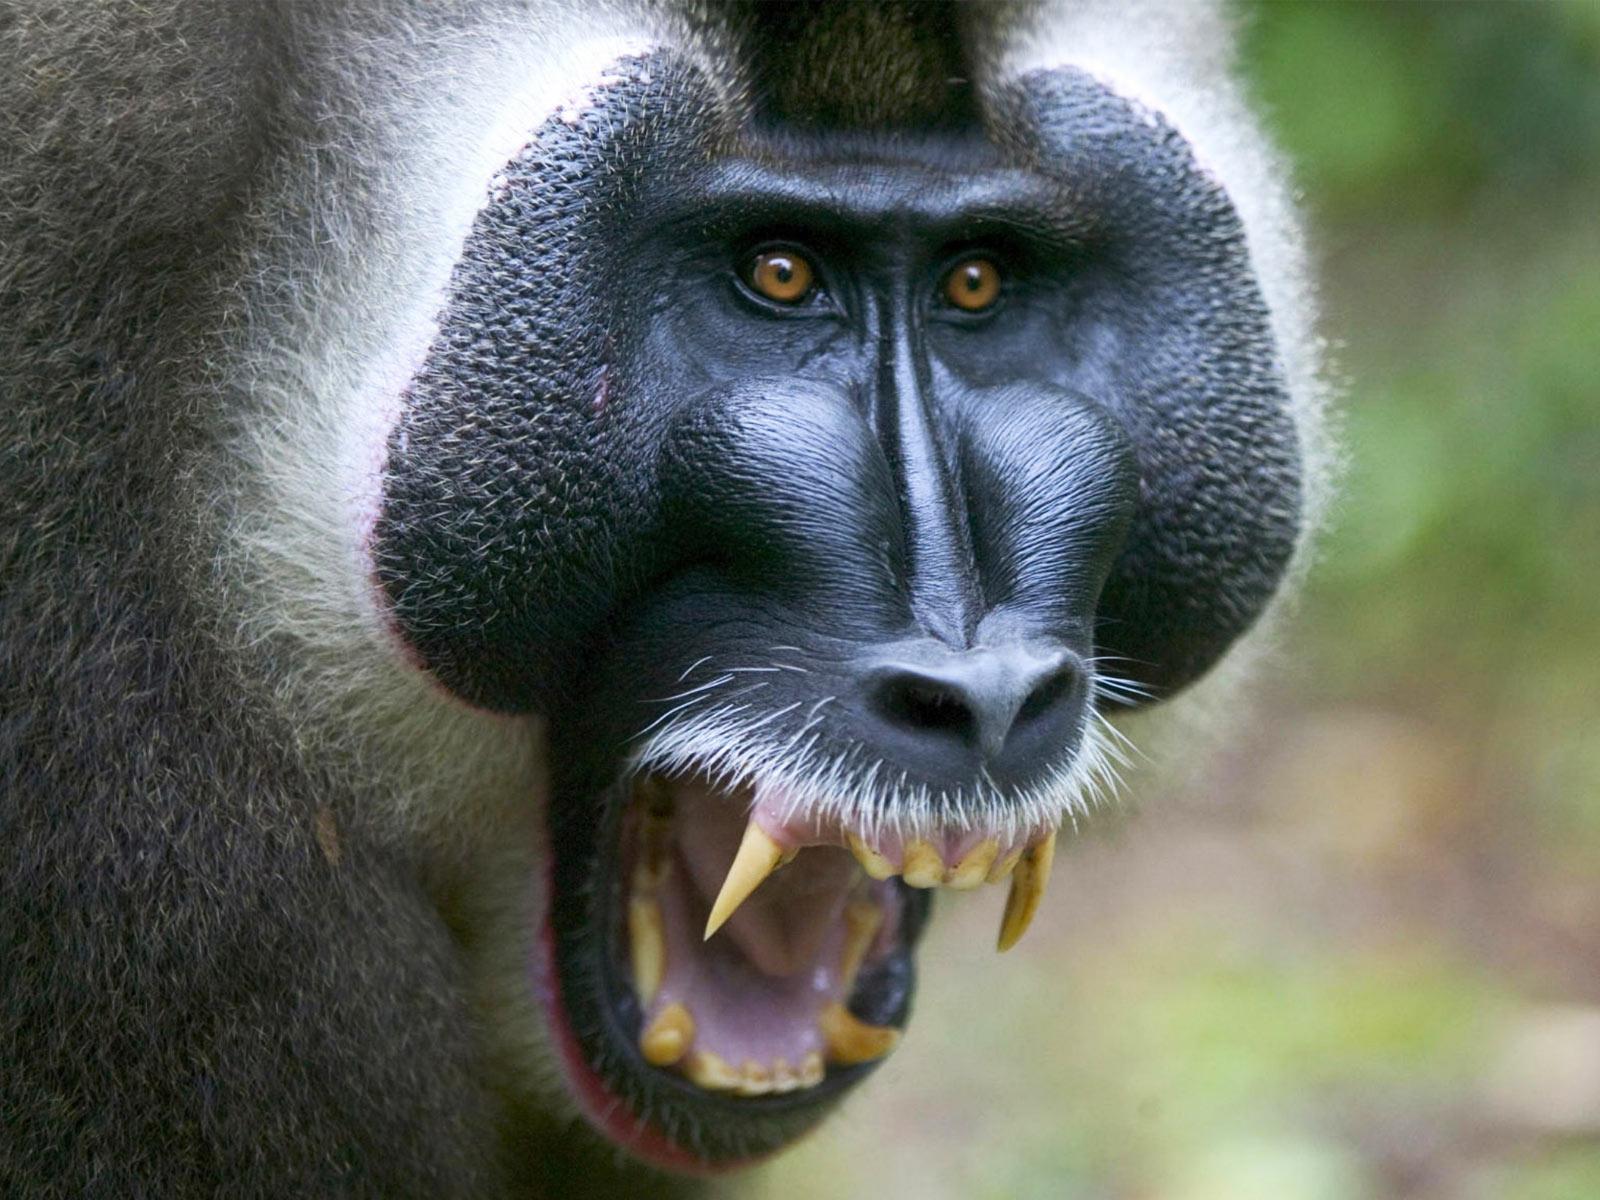 A Trifecta Of Horrifying Monkey